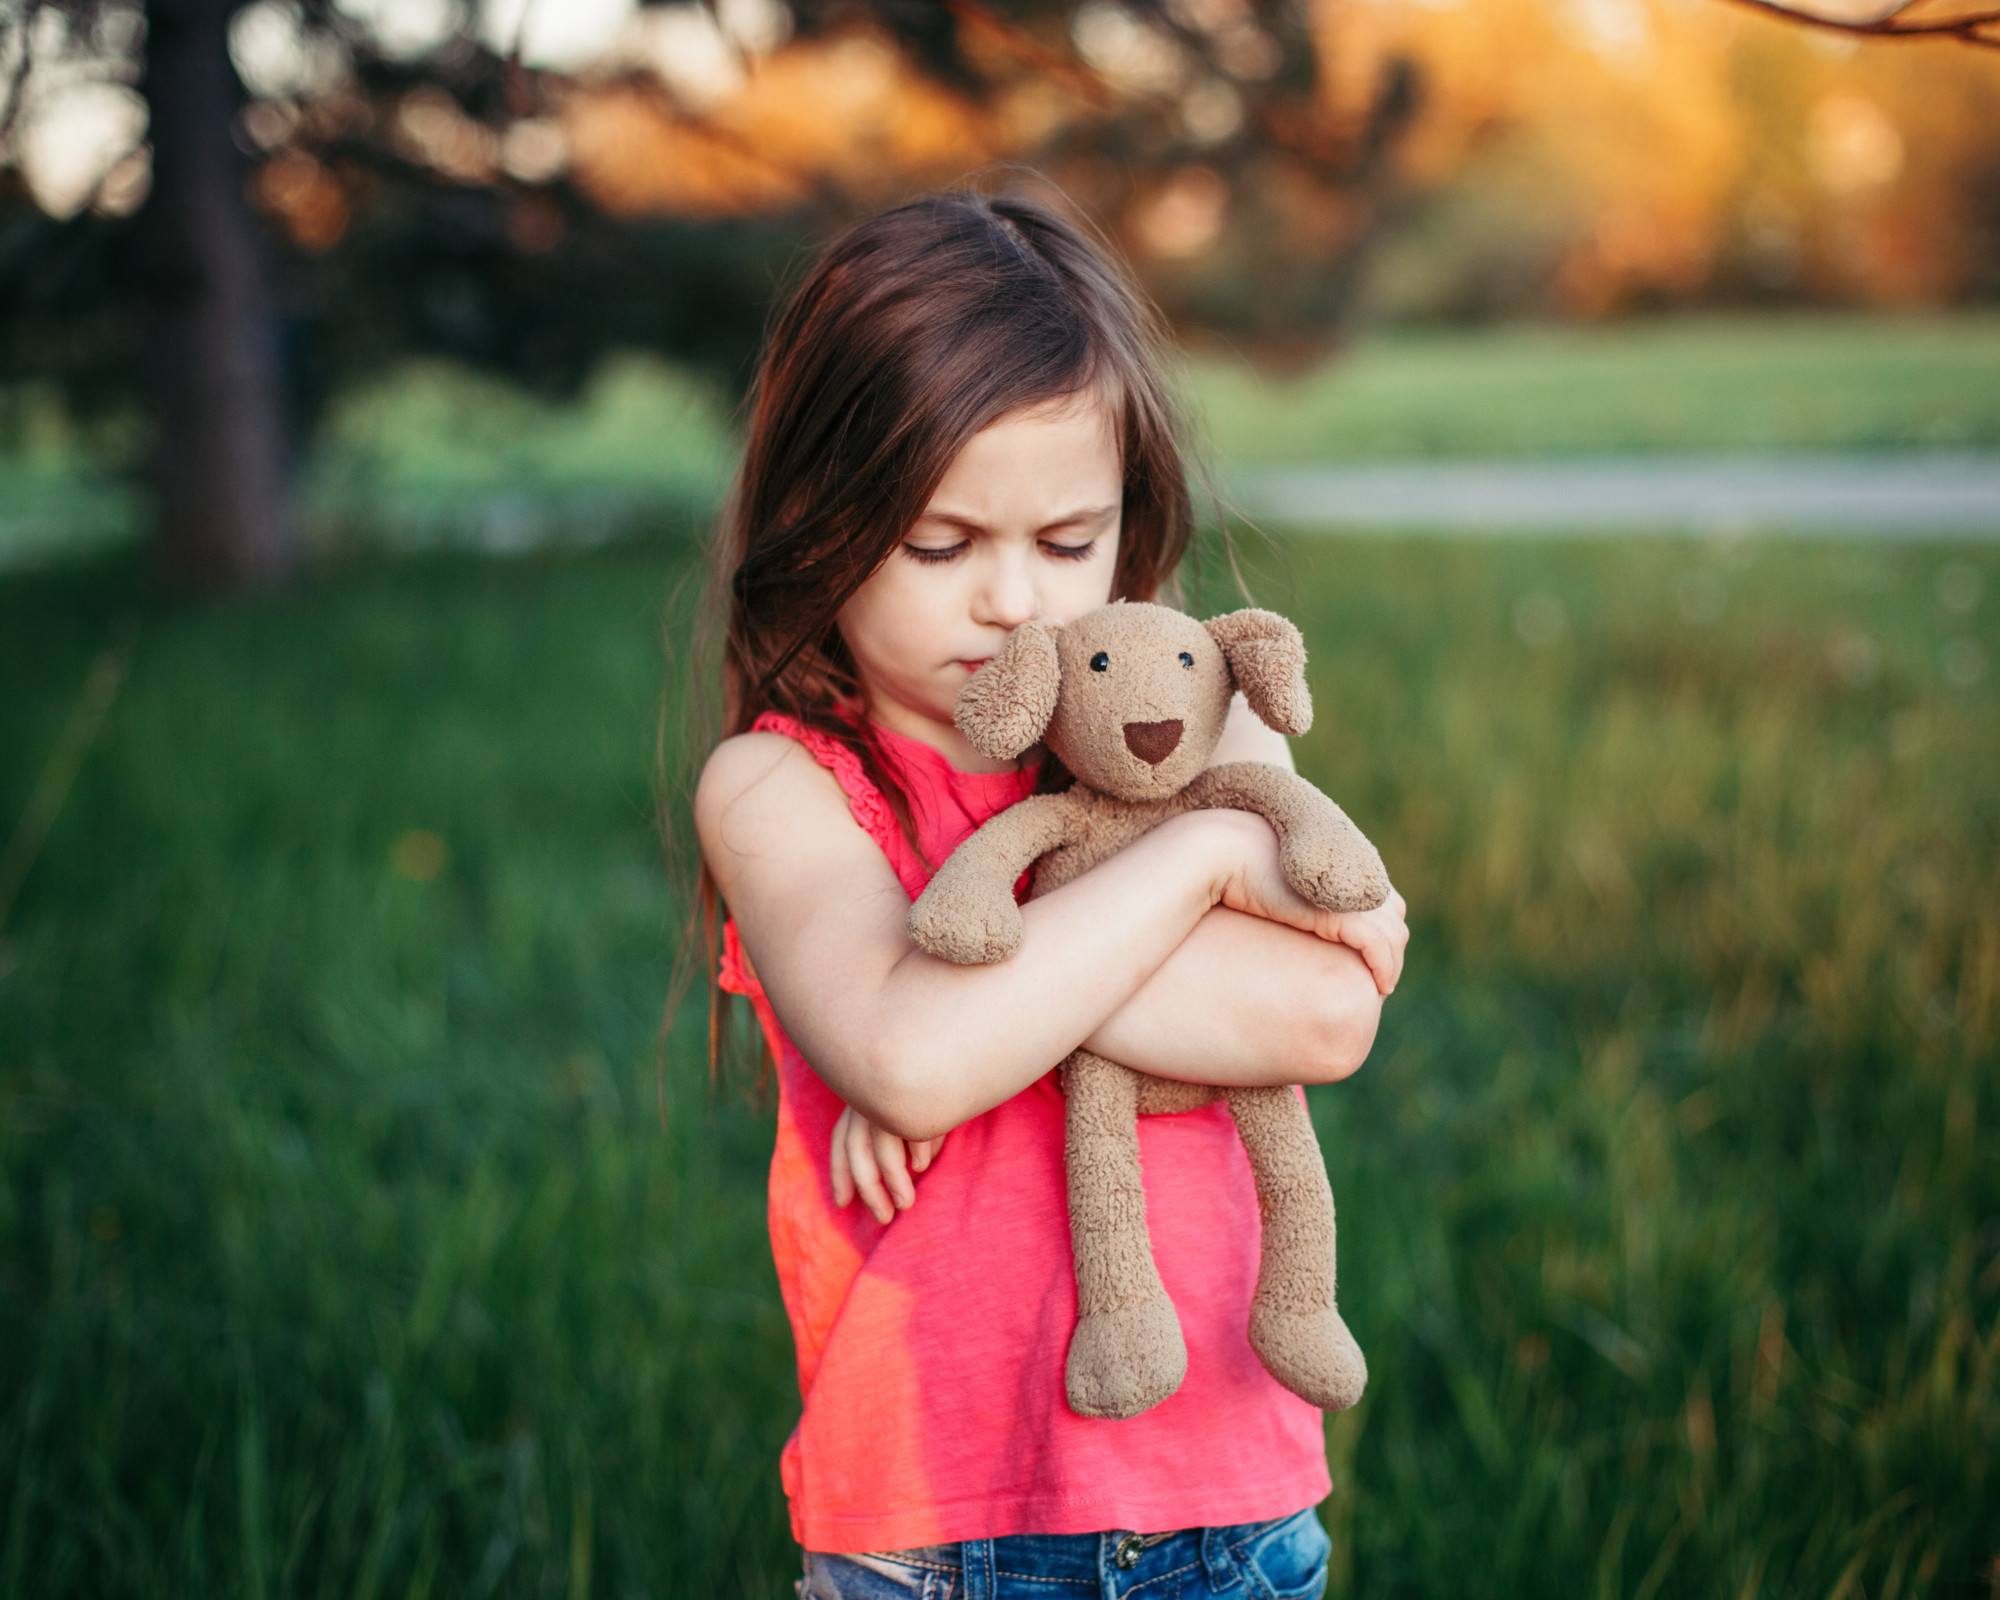 girl hugging stuffed animal dog